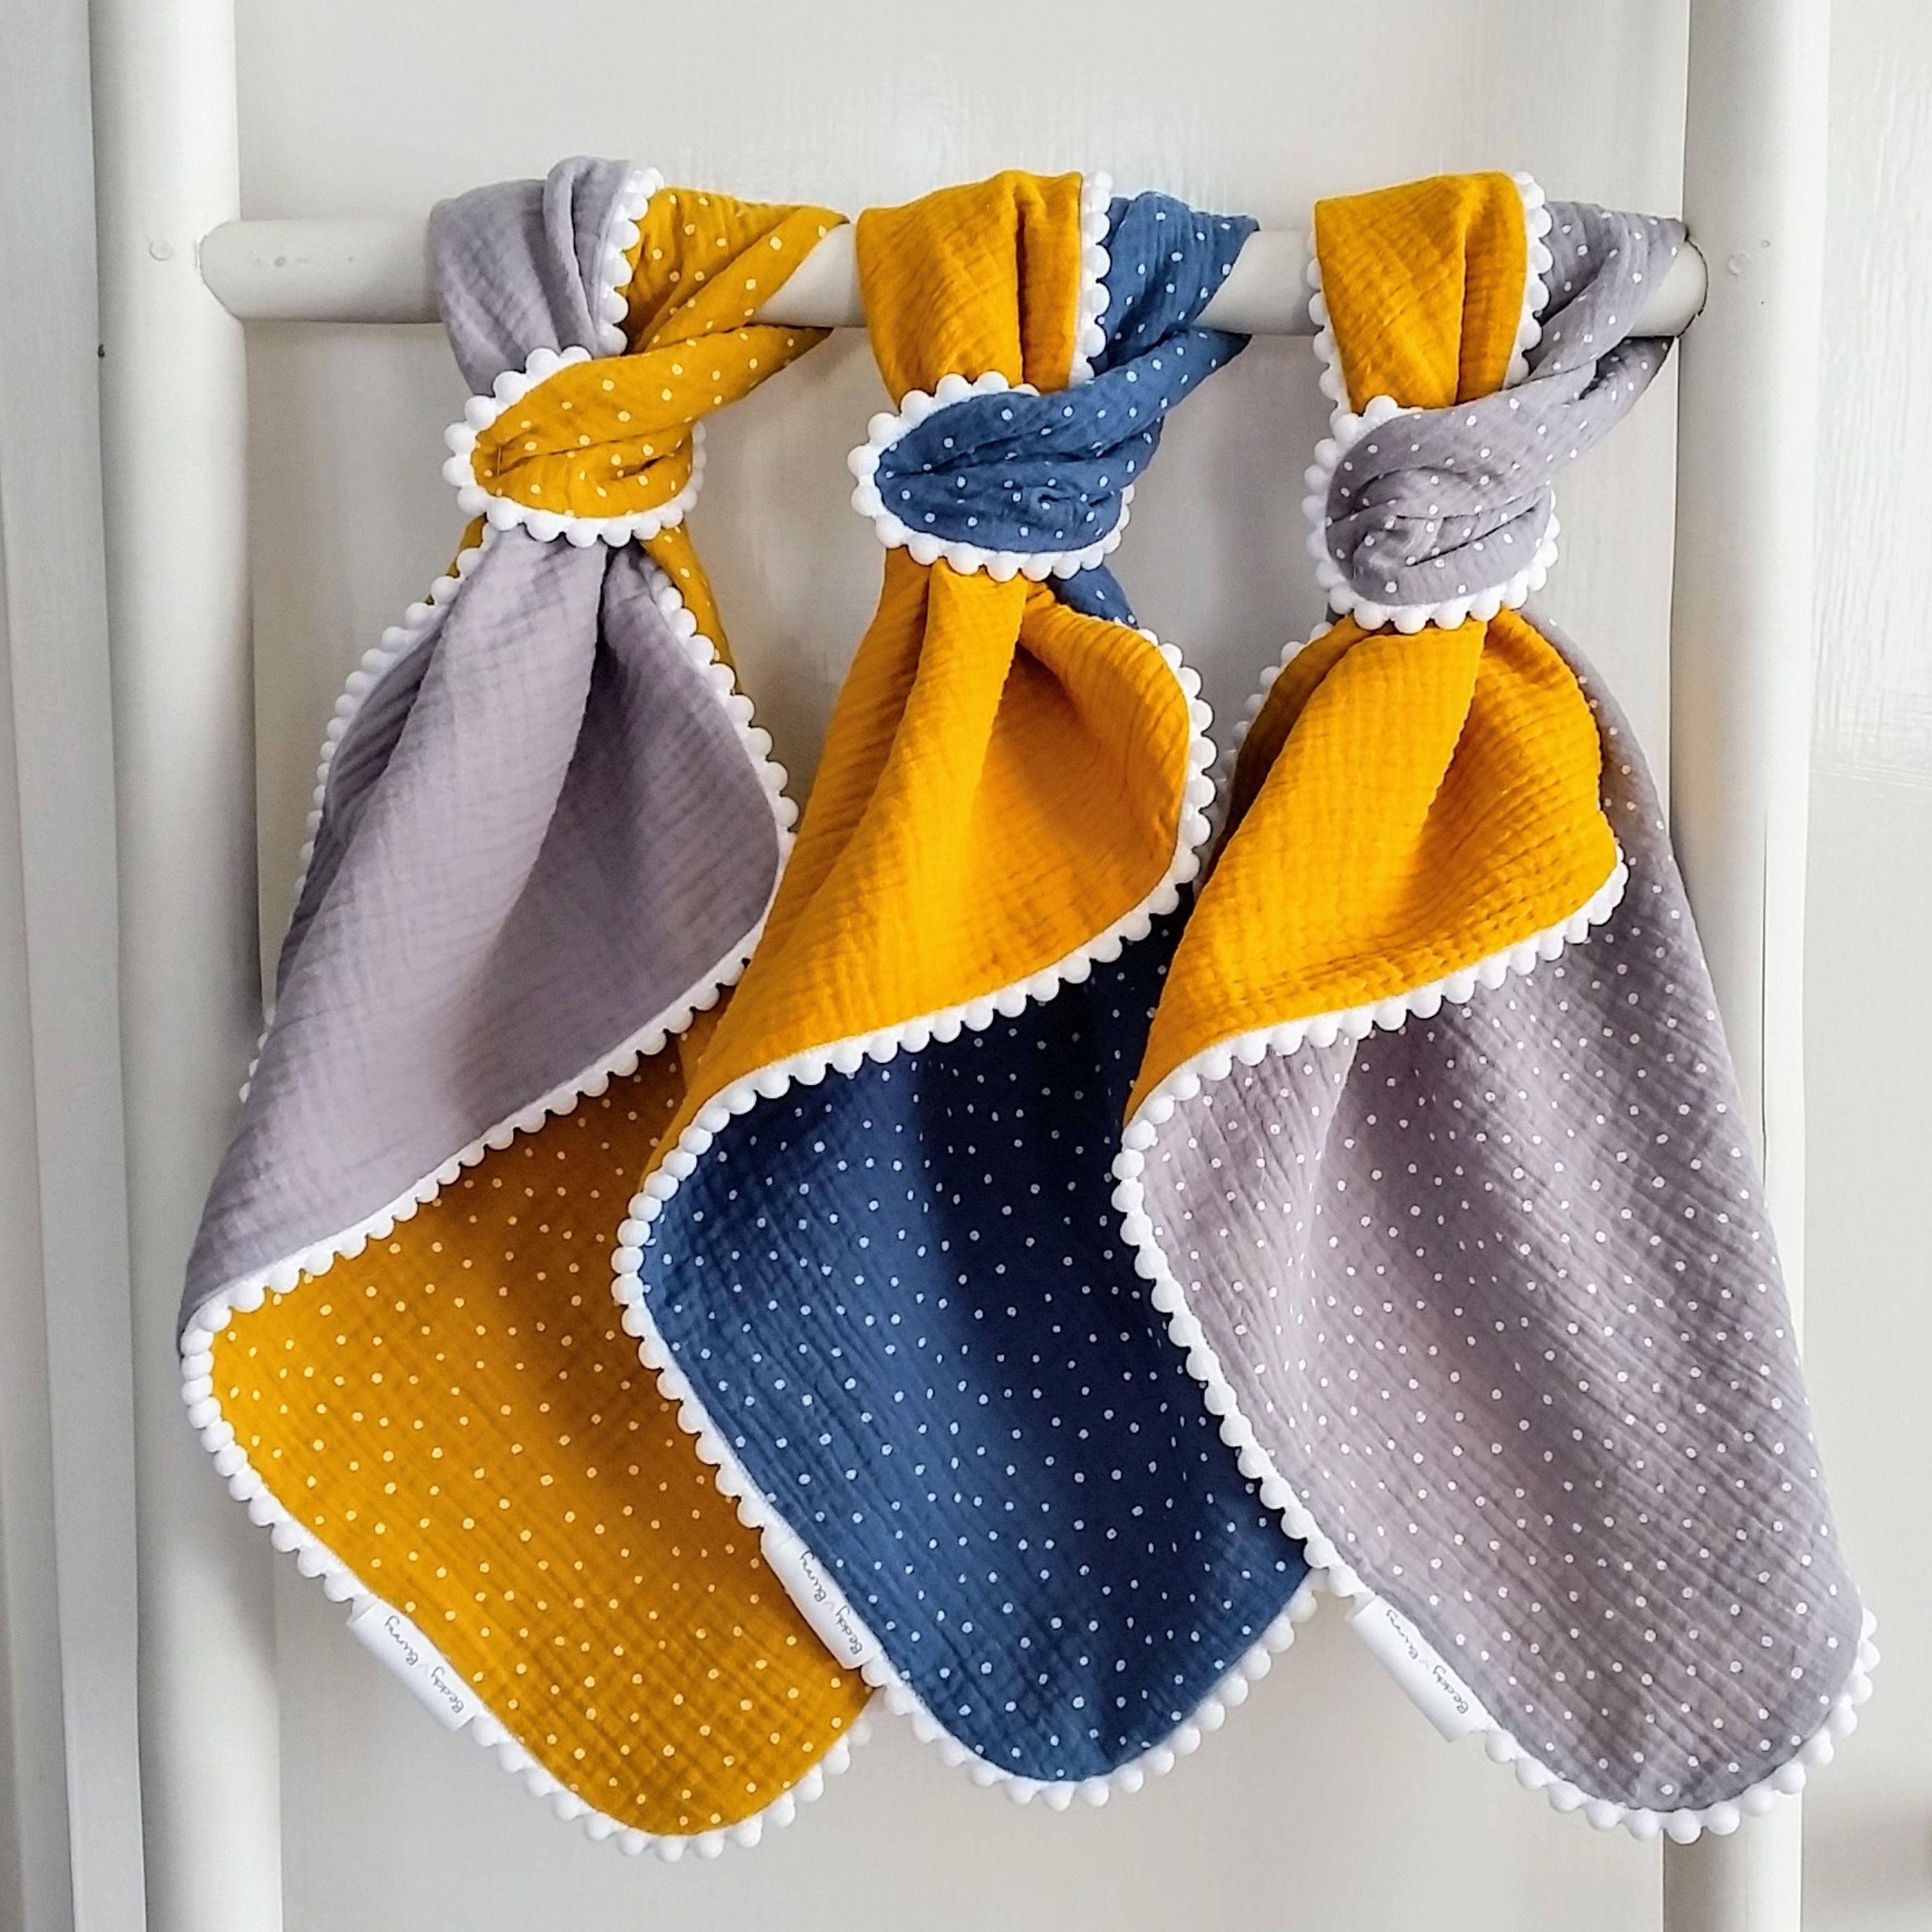 Pom Pom Comfort Blanket Muslin Comforter Pom Pom Mini Blanket Mustard Dots Blanket Cute Baby Blanket Double Gauze Security Blanket Muslin Baby Blankets Unique Baby Gifts Baby Lovey